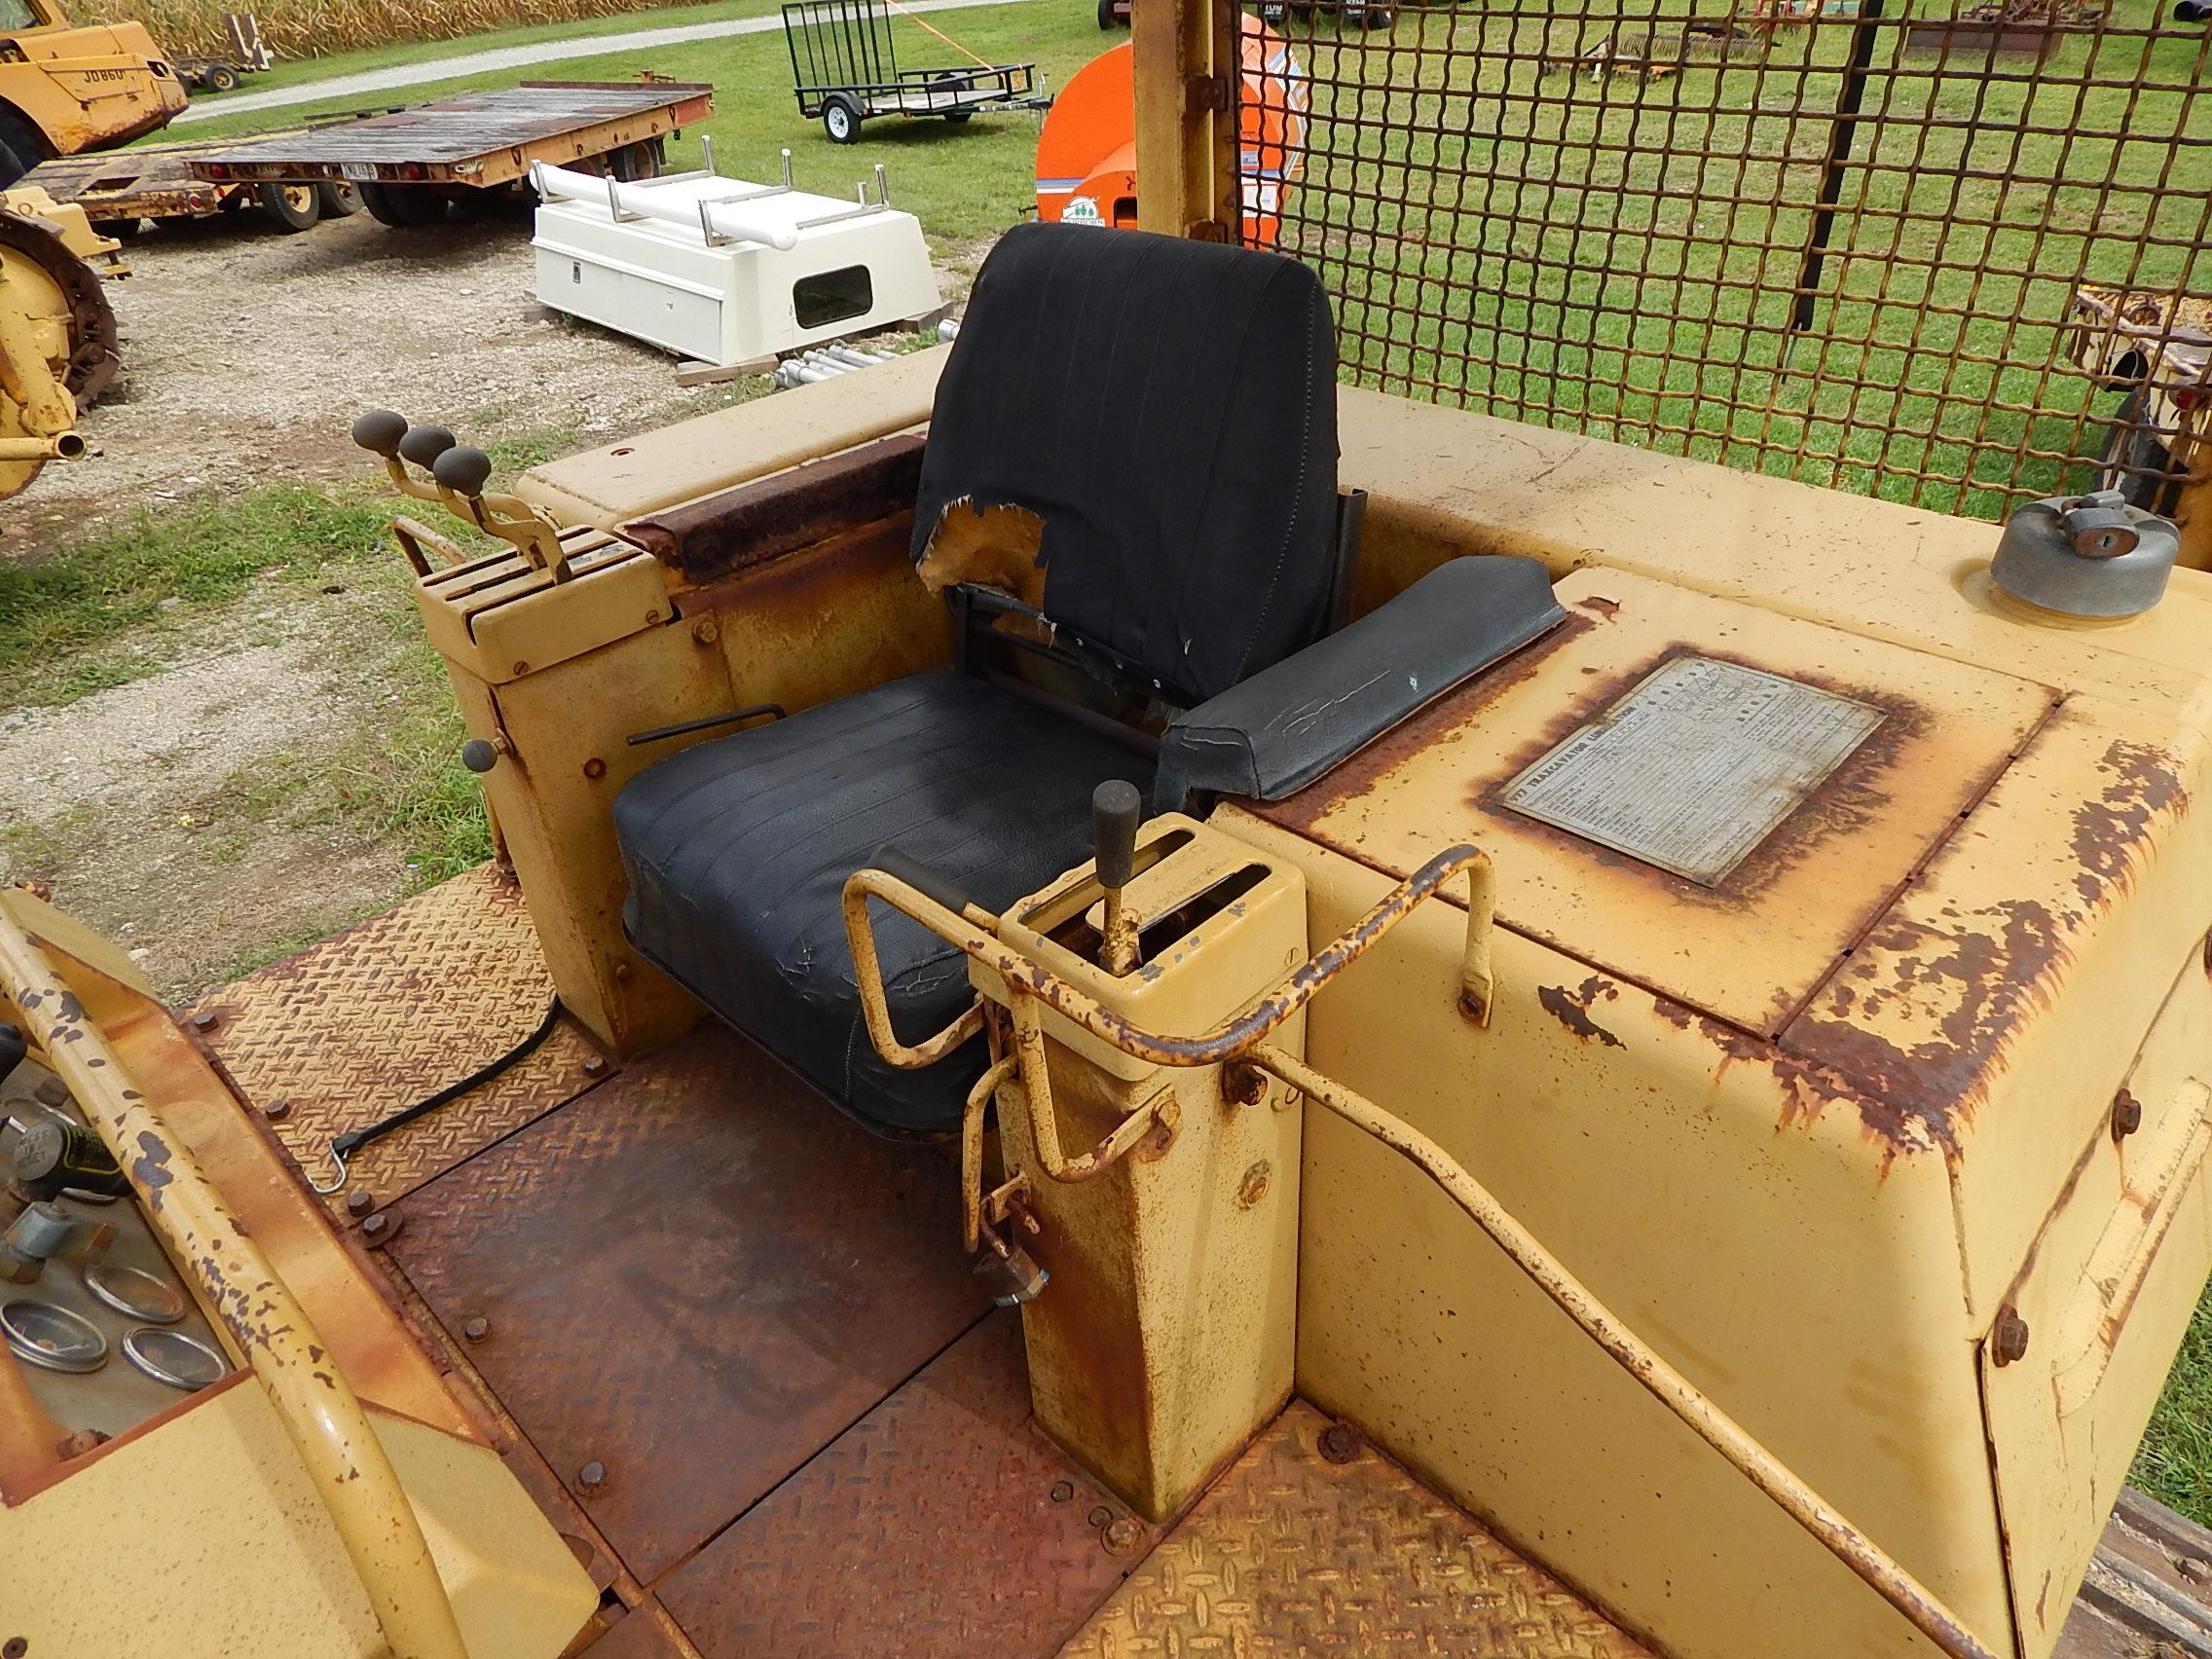 Lot 198 - Caterpillar 977K Crawler Loader, 170 HP, 2.5 Yd. 8 ft 4-Way Bucket, OROPS, 10,352 Hours, sn 11K2609